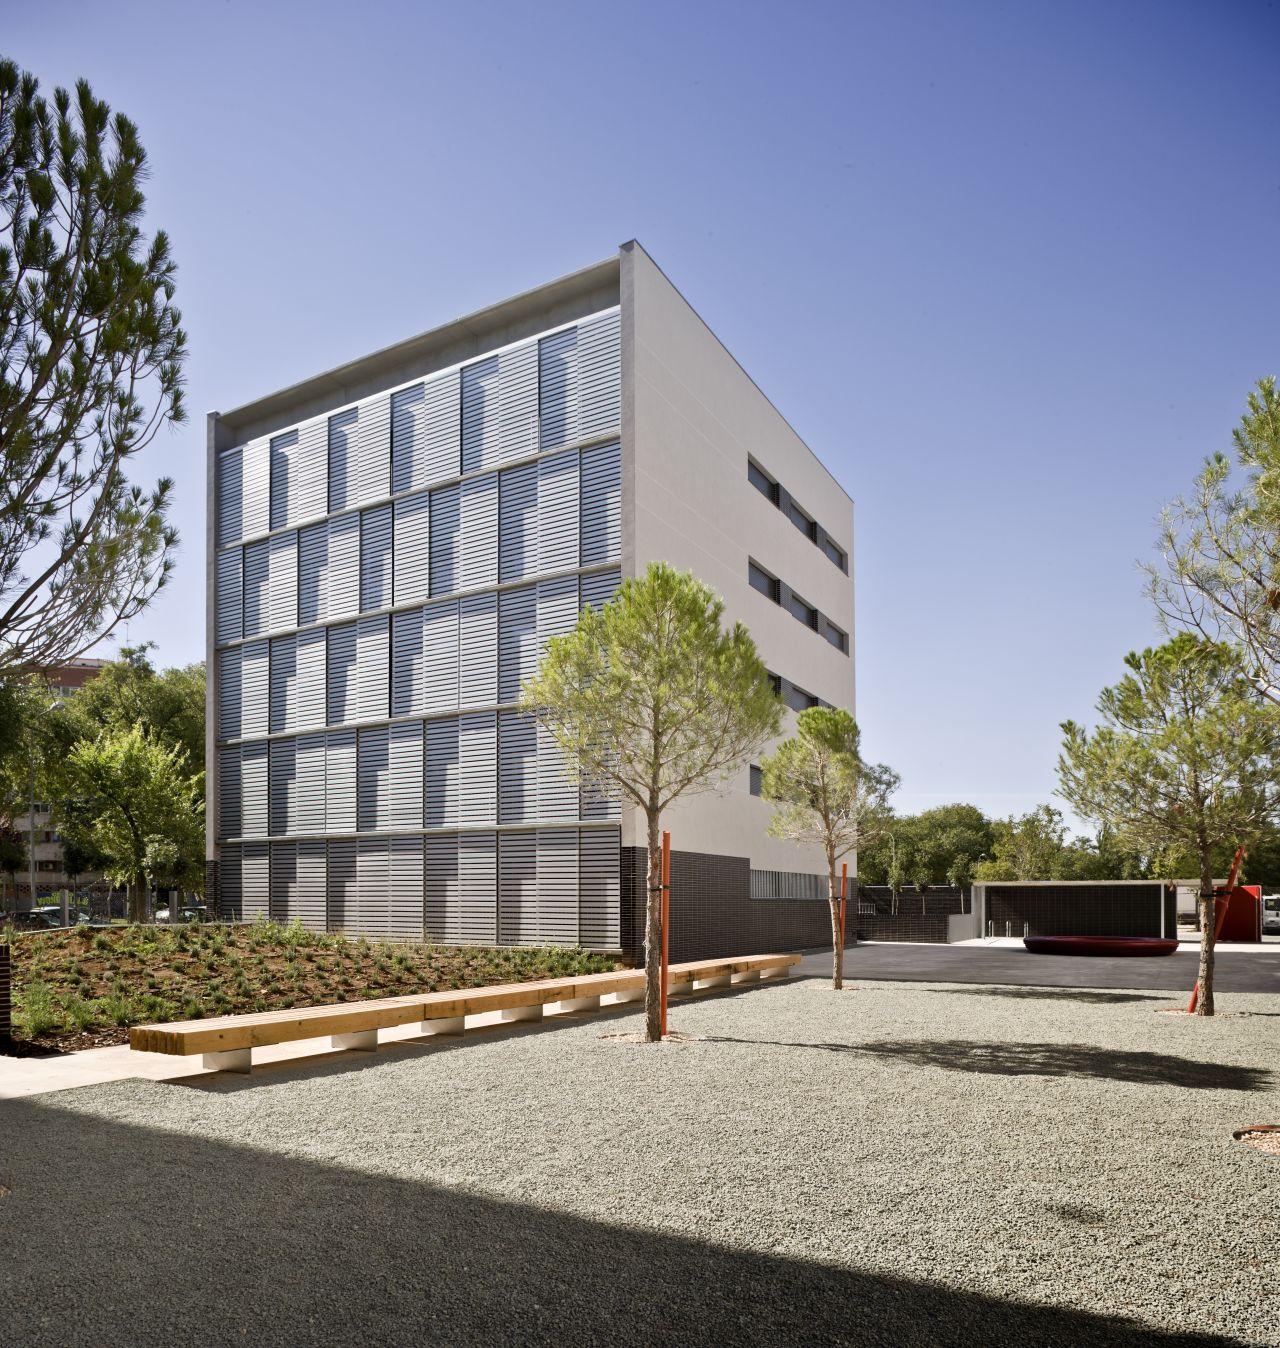 Galeria de conjunto habitacional em albacete burgos garrido arquitectos 8 - Arquitectos albacete ...